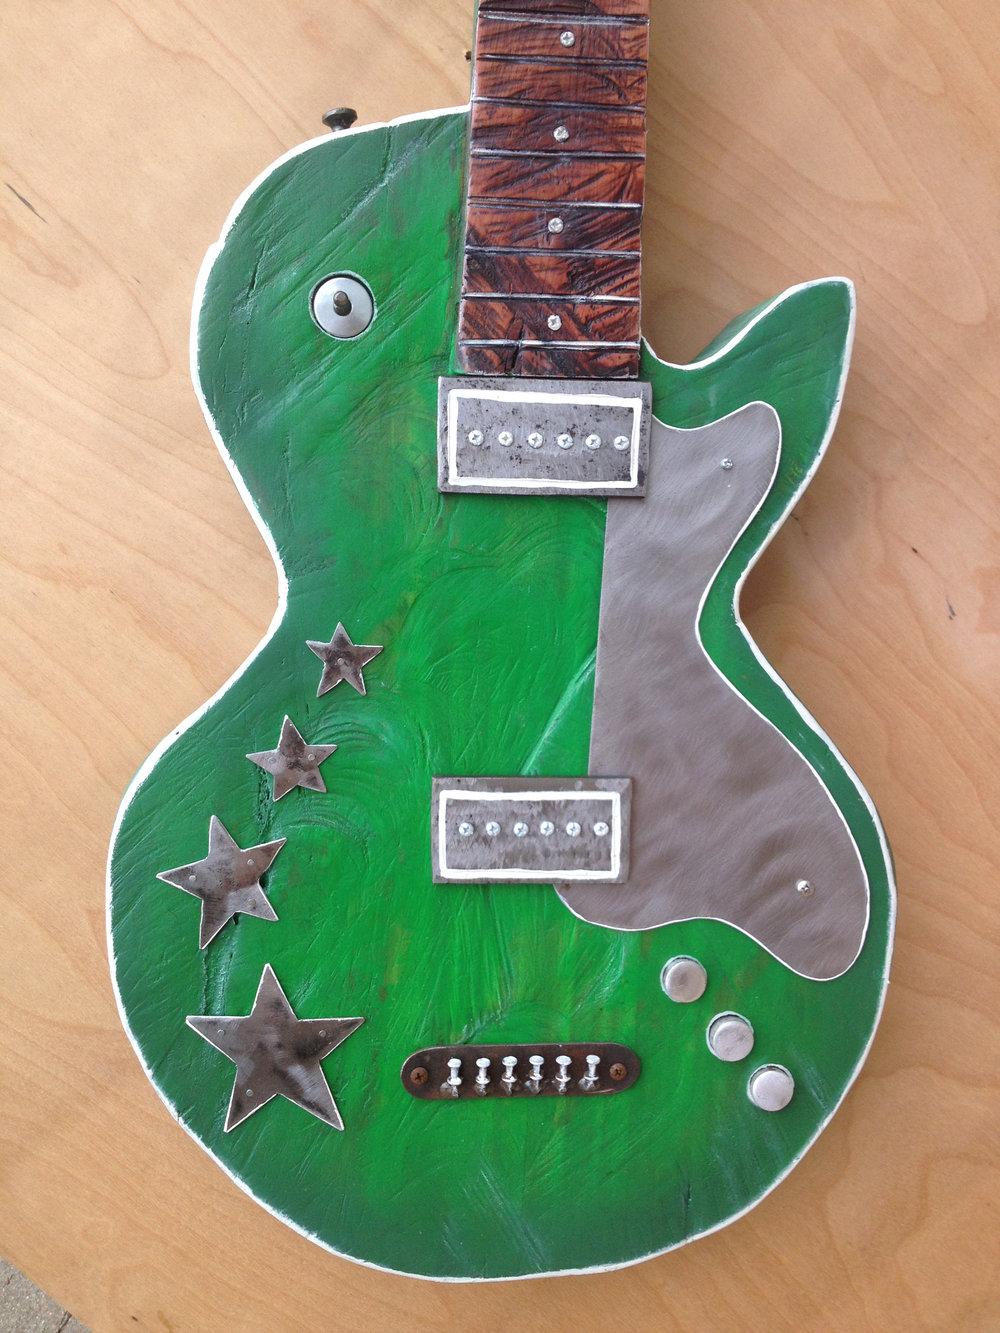 green-guitar-02_26436074652_o.jpg